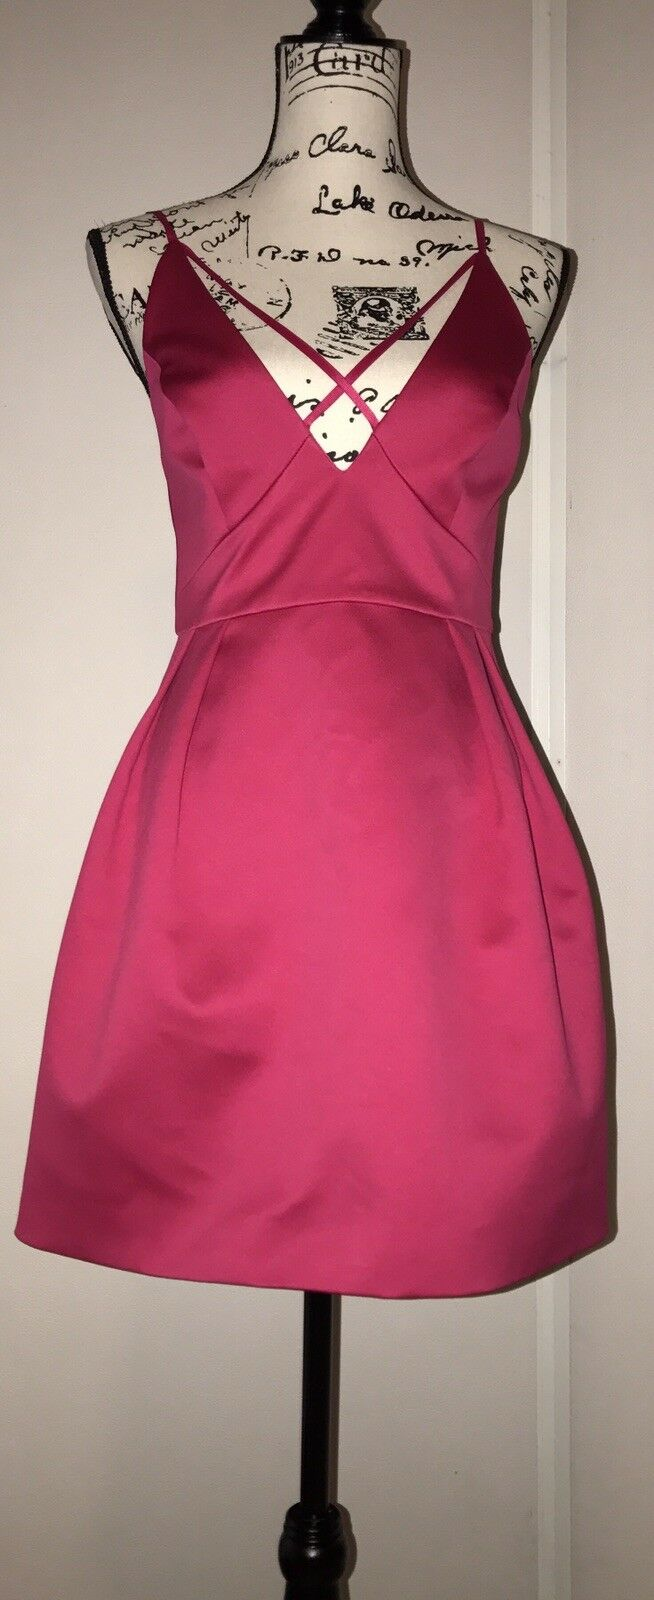 Topshop Cross Front Mini Dress Rosa Größe 6 US